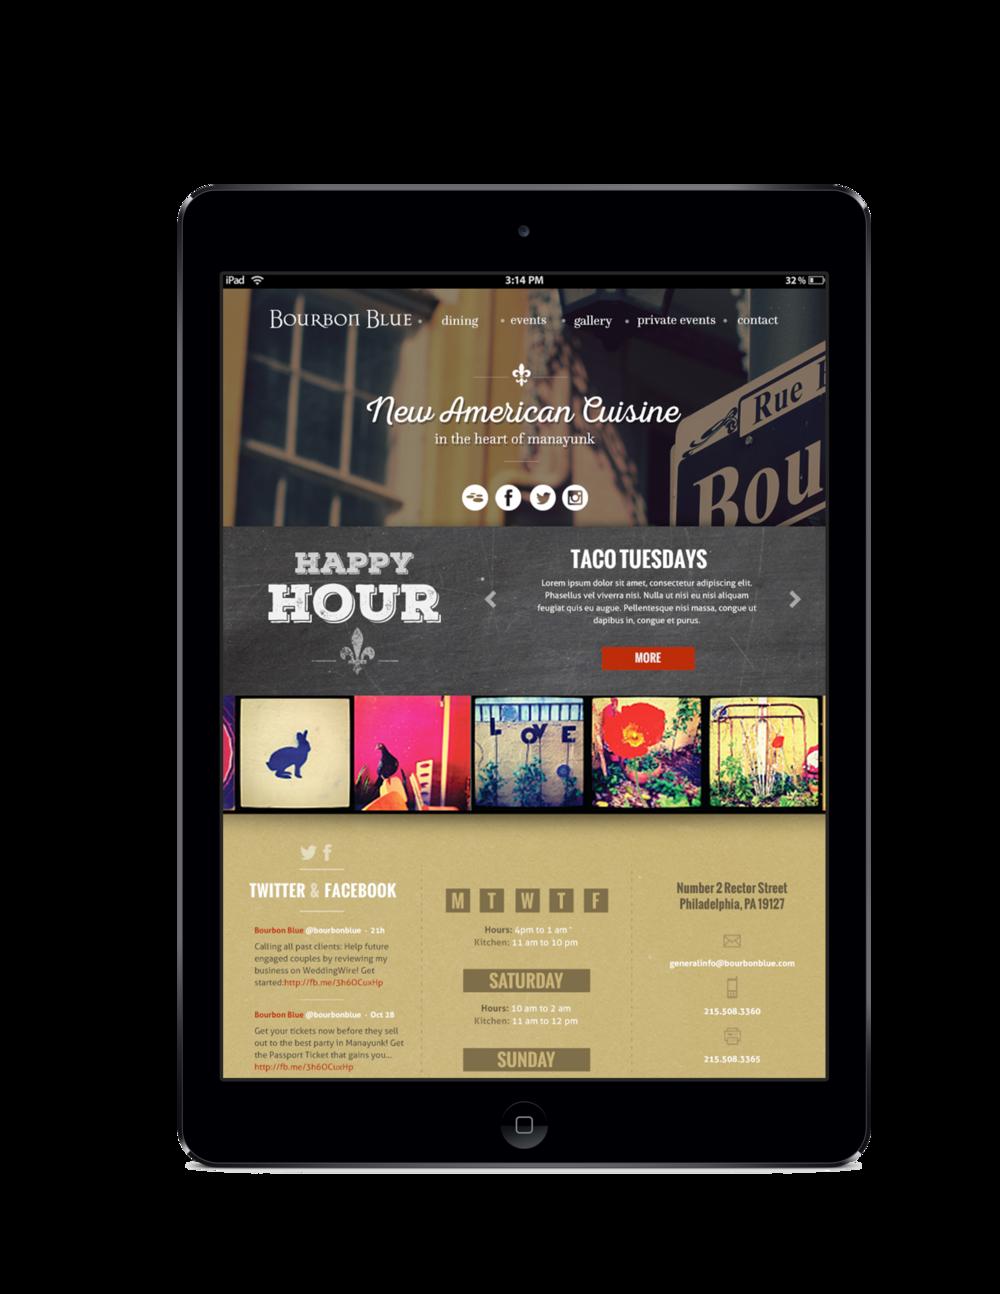 BourbonBlue-Homepage_Ipad.png